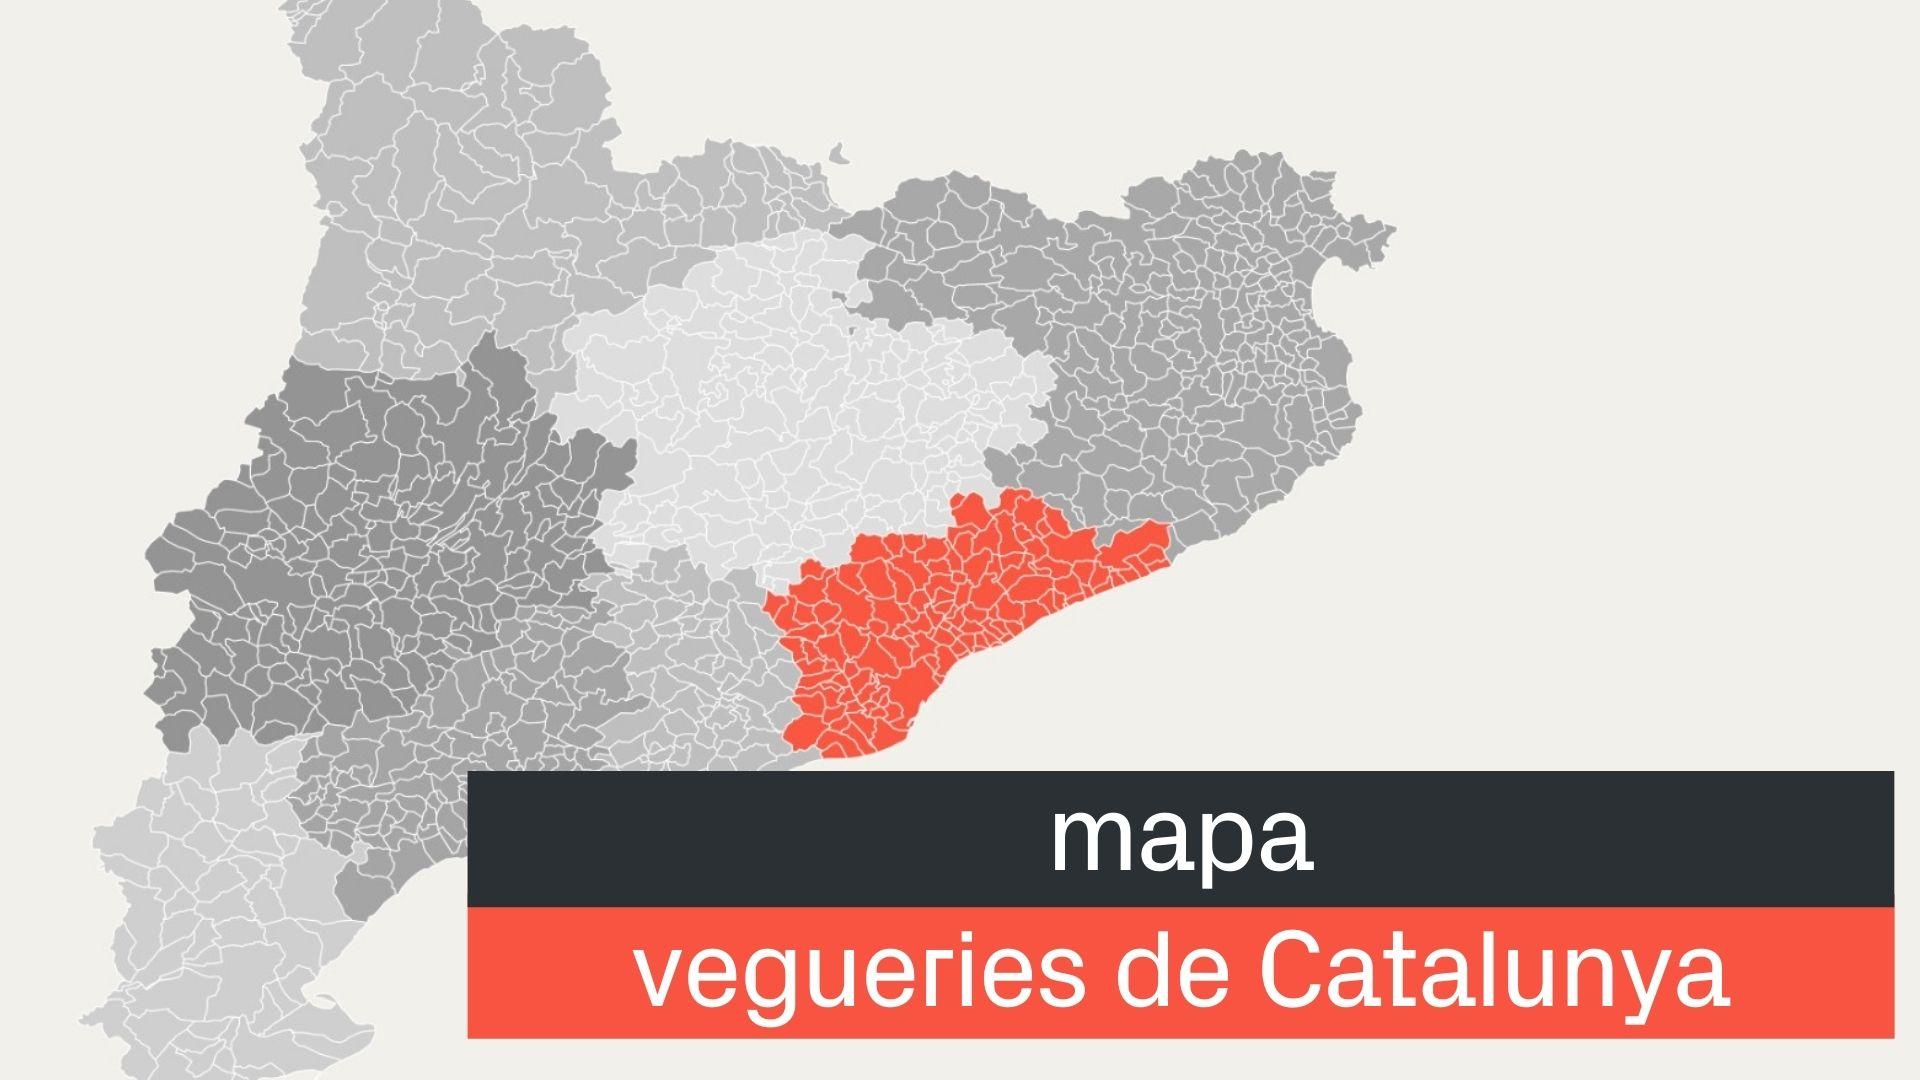 mapa de vegueries de Catalunya